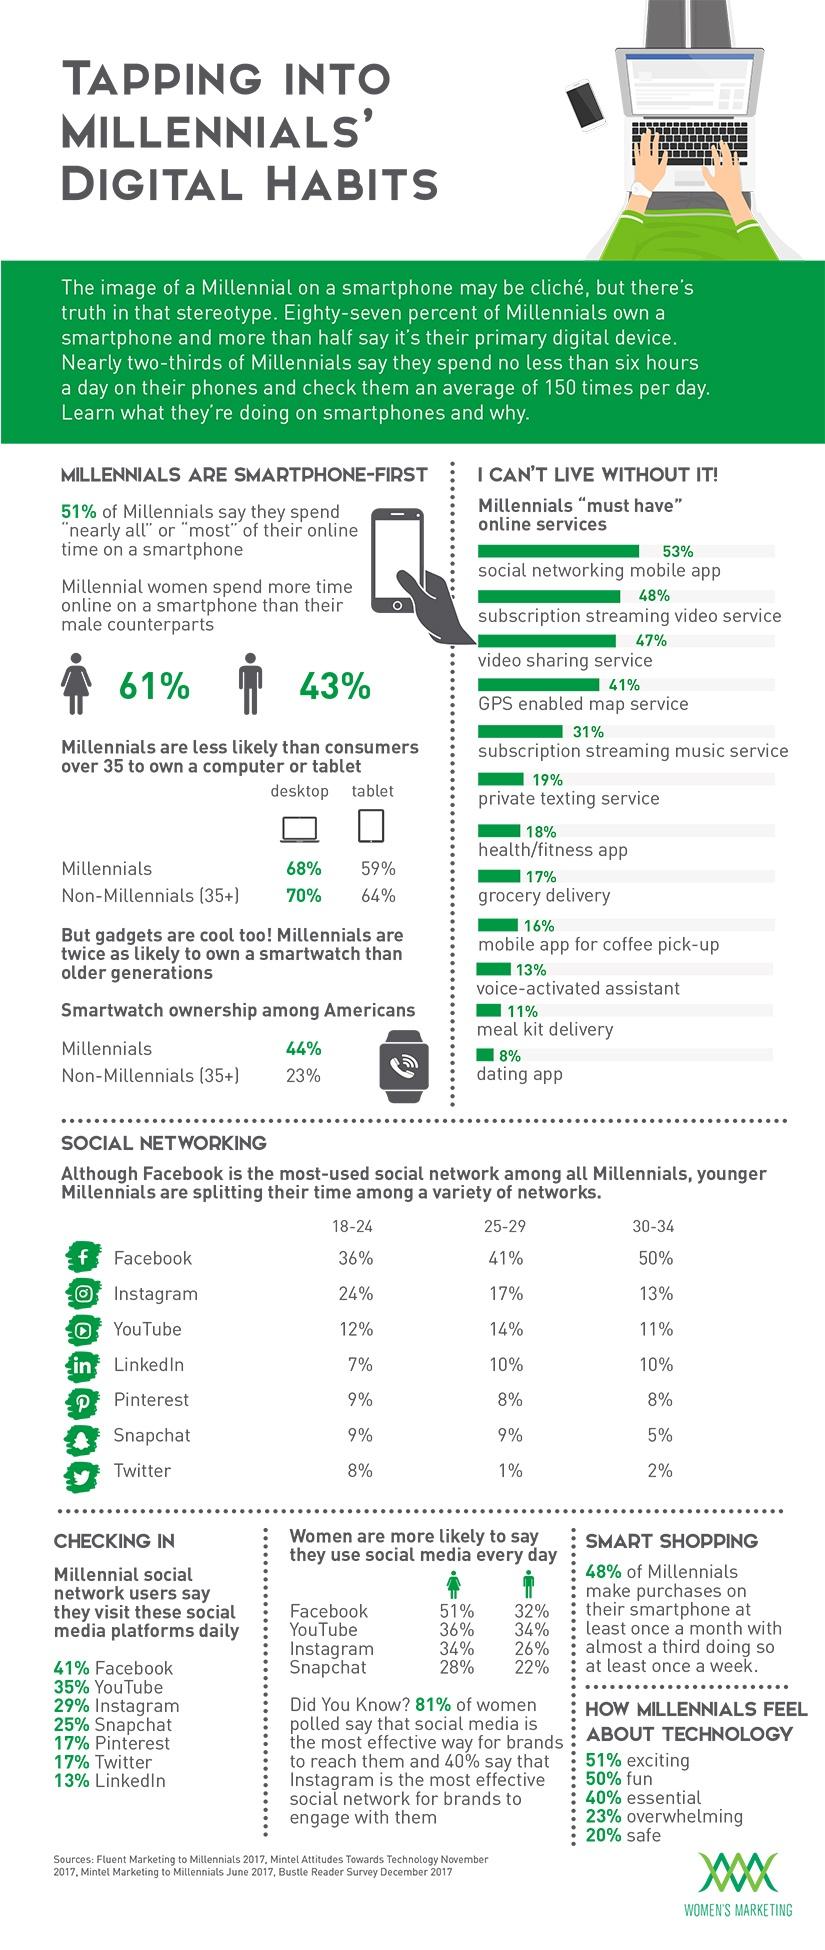 MillennialDigitalHabits_Infographic.jpg